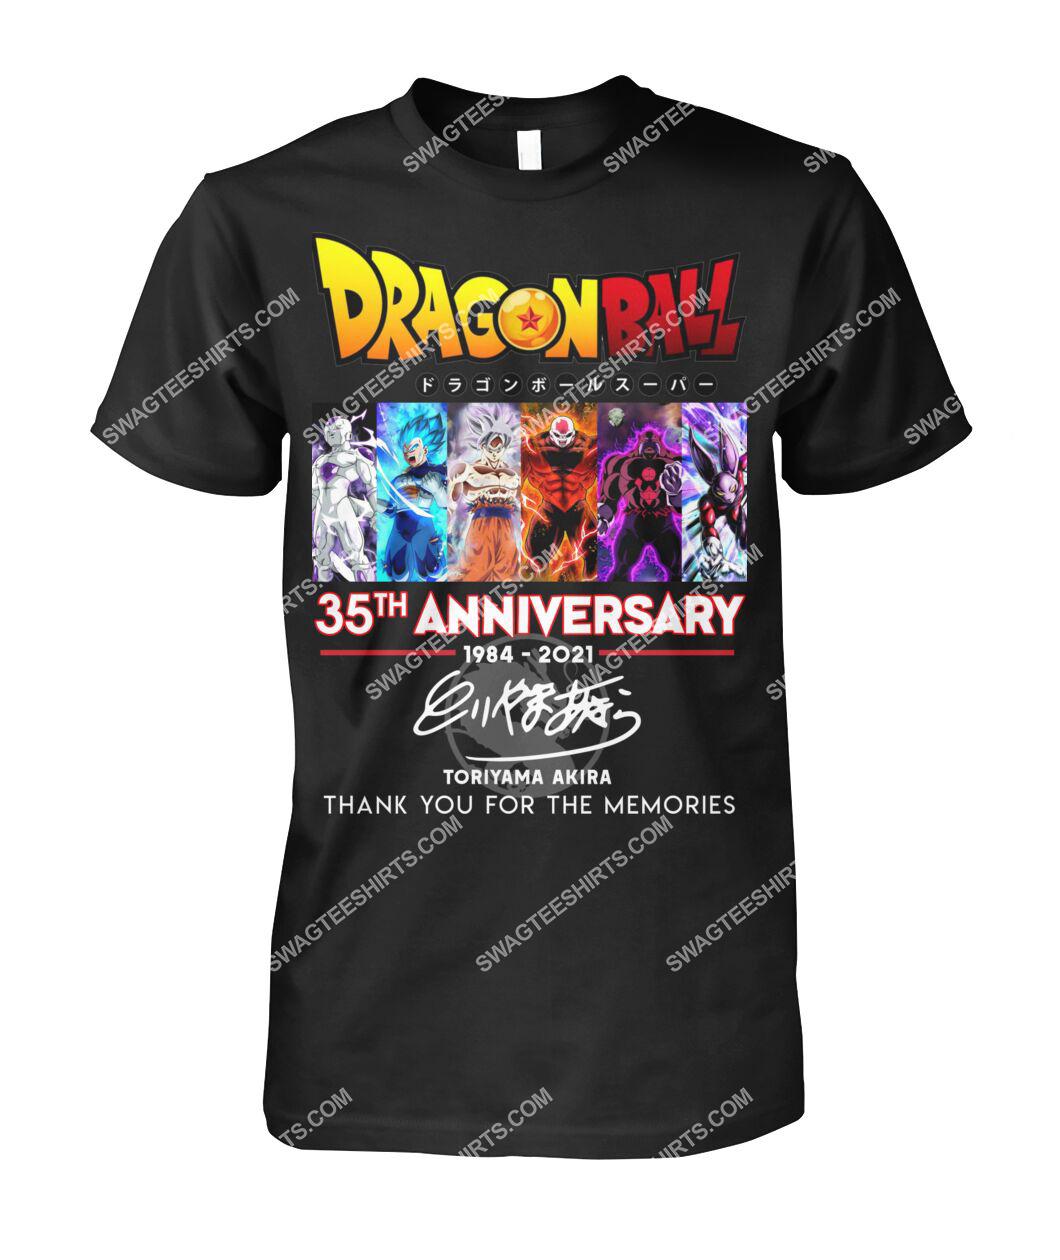 dragon ball z 35th anniversary thank you for memories signatures tshirt 1